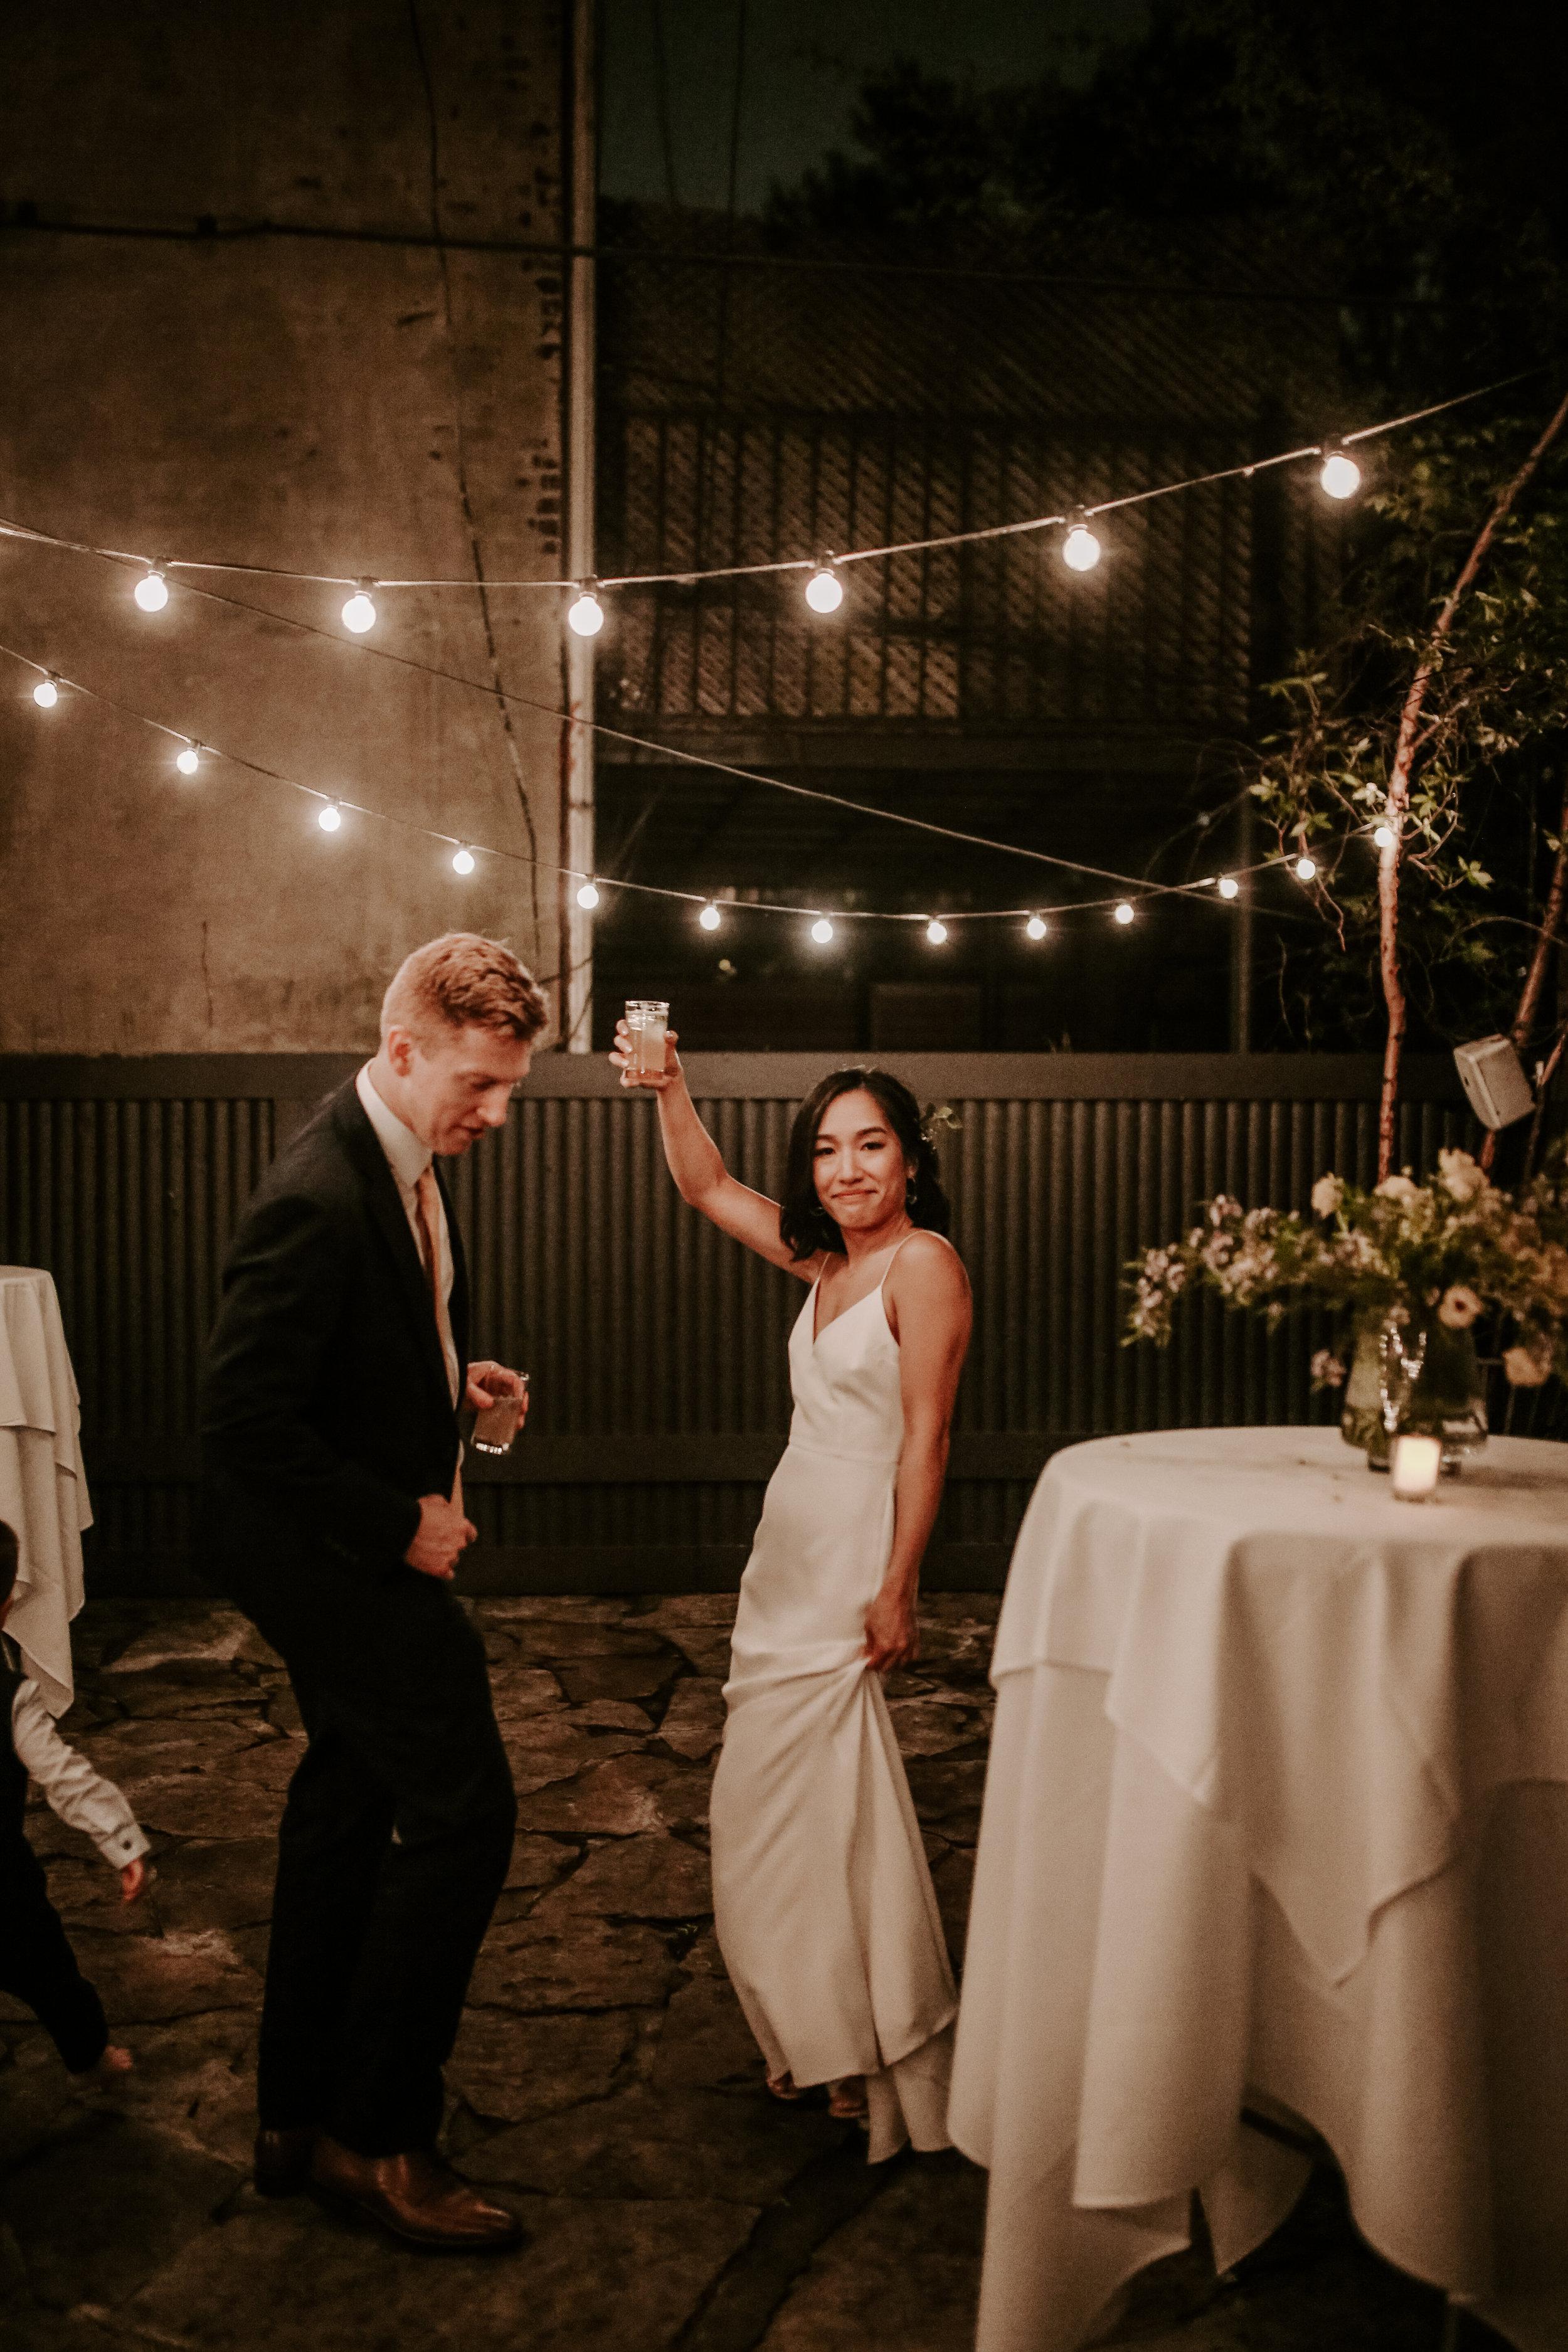 TheNichols_Married_2019-350.jpg